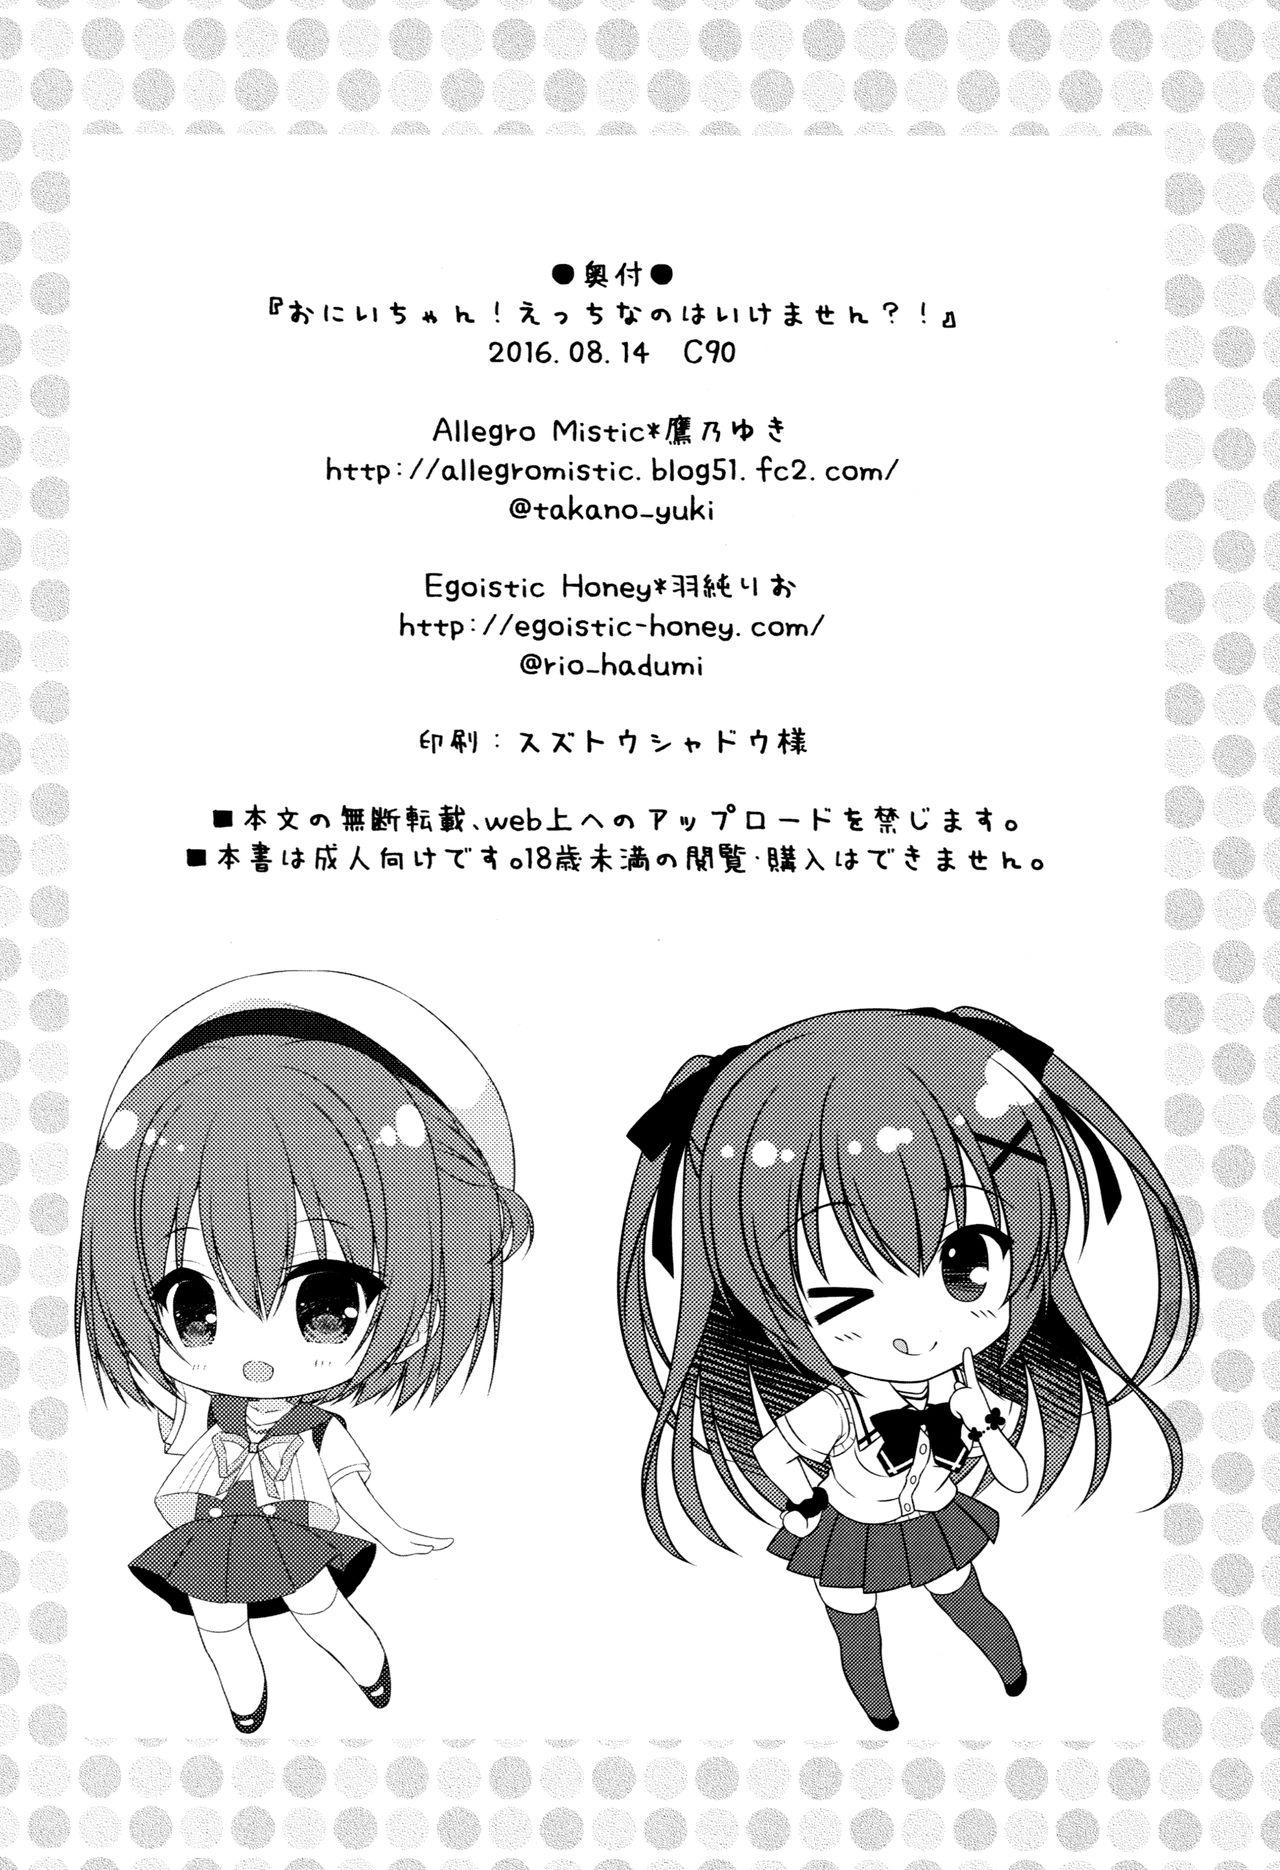 (C90) [Allegro Mistic, Egoistic Honey (Takano Yuki, Hadumi Rio)] Onii-chan! H nano wa Ikemasen?! | Onii-chan! Wanna Fuck!? [English] [Marv] 20